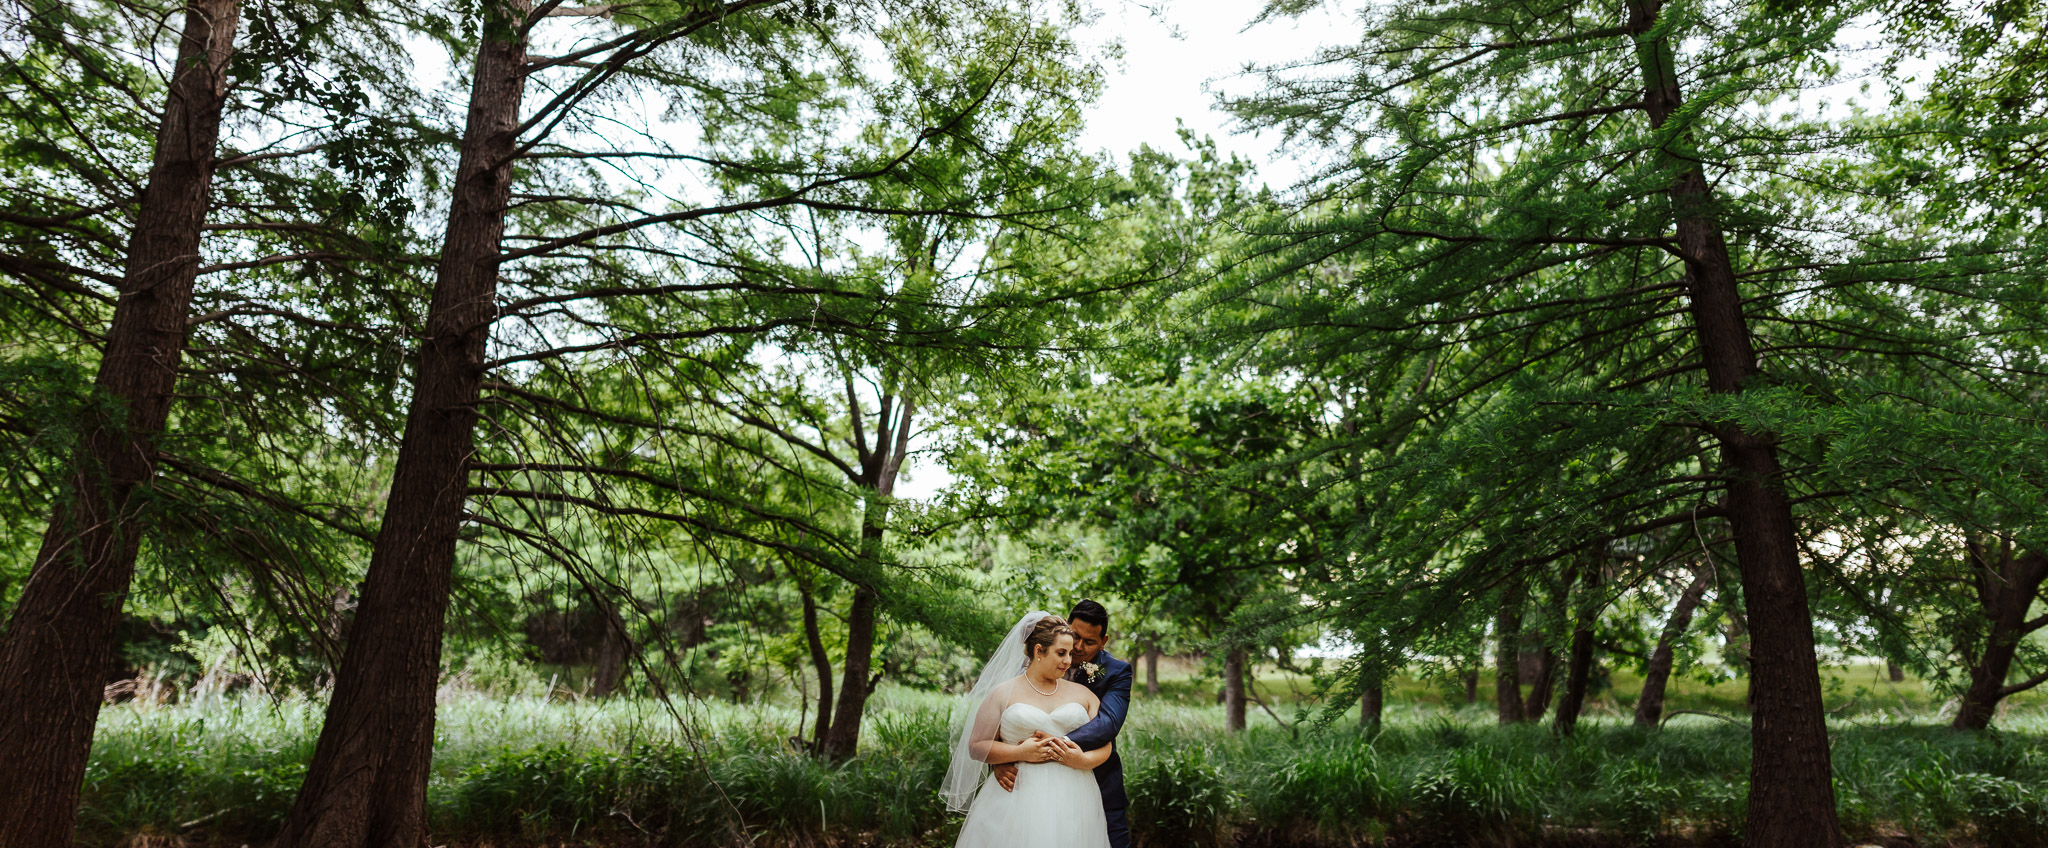 Christoval-Texas-Wedding_Photographer-Meghan&Tony-0029.jpg